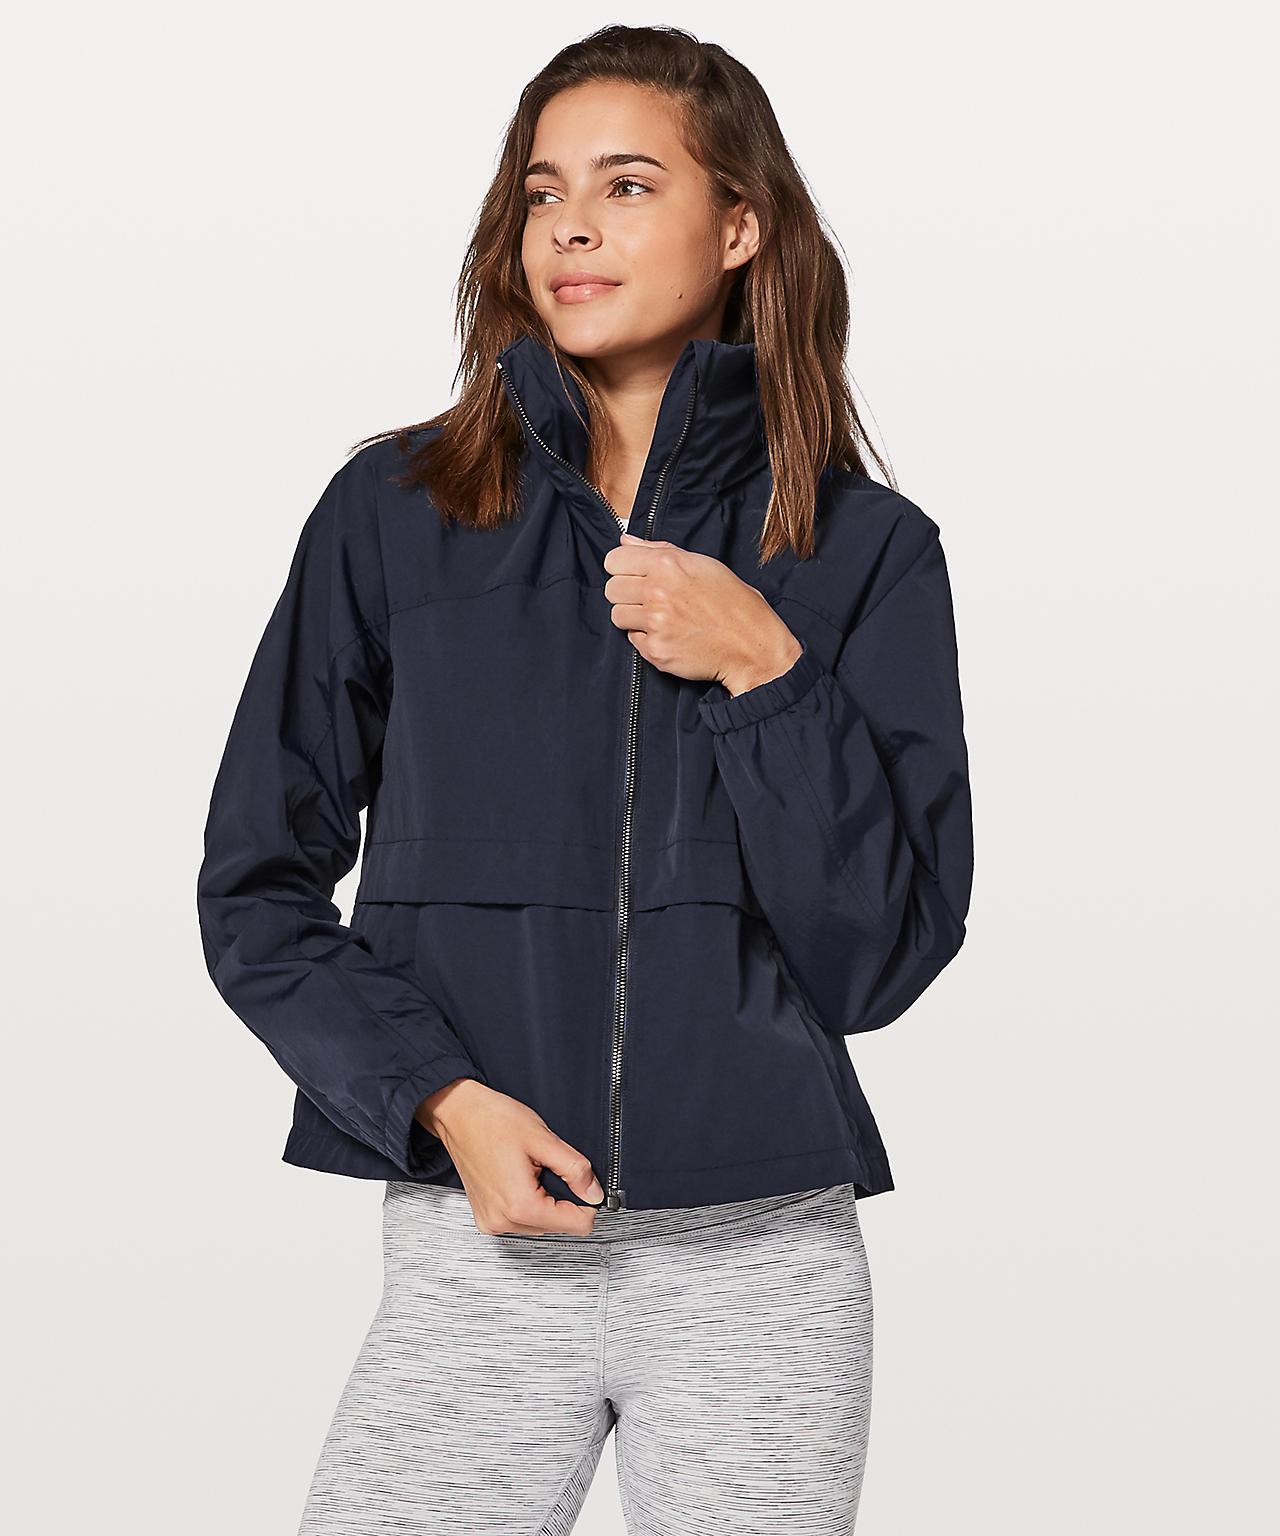 lululemon effortless jacket edit seven 2018 toronto